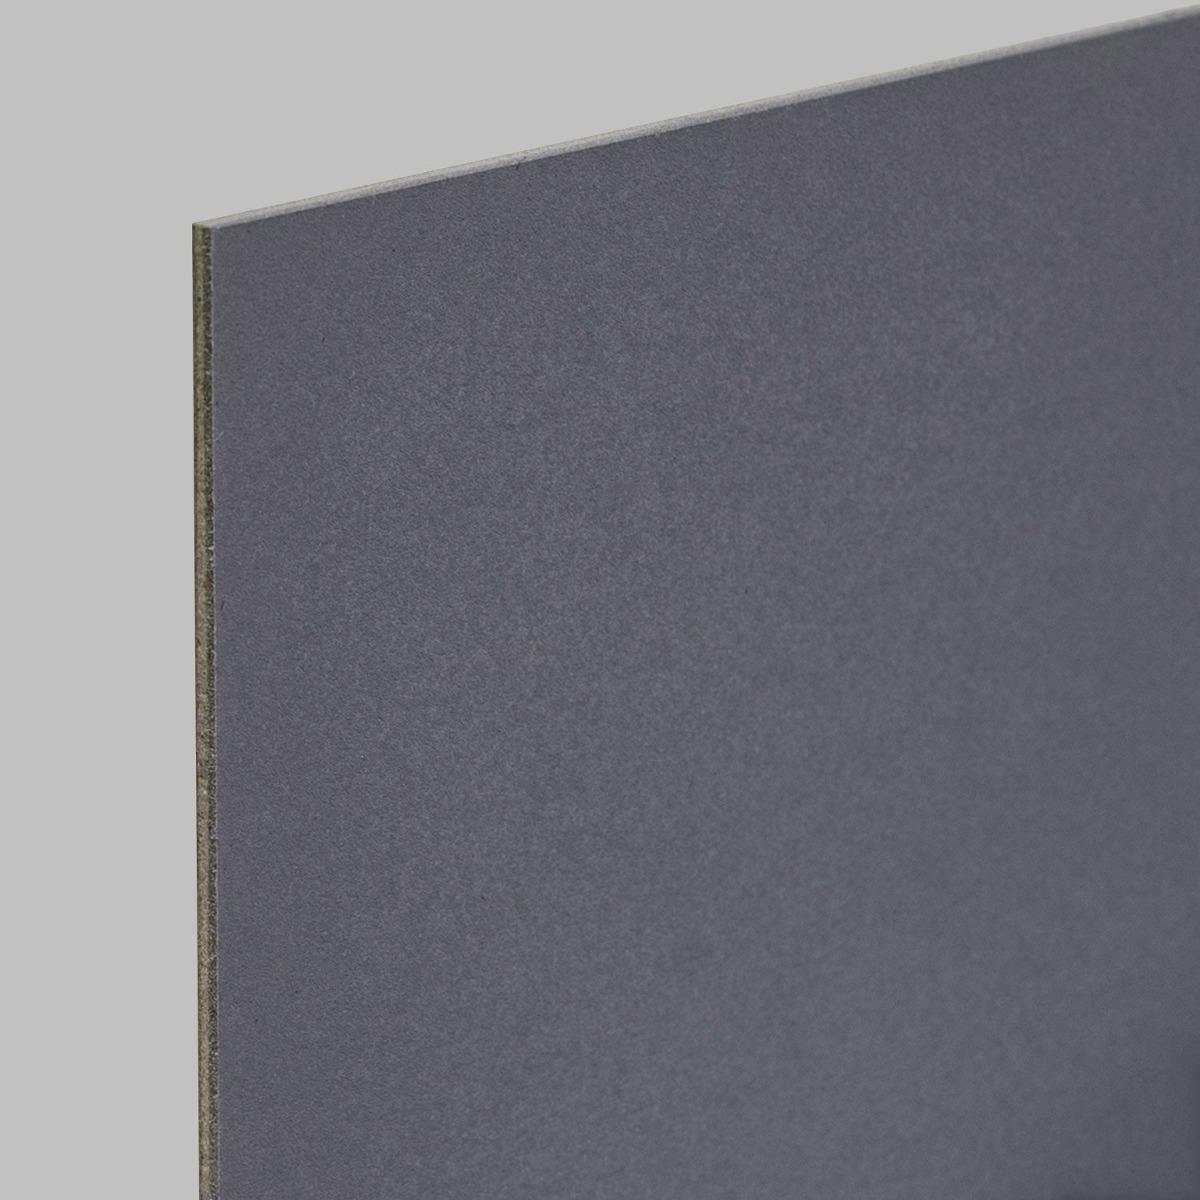 ampersand museum series pastelbord para pasteles carbón l